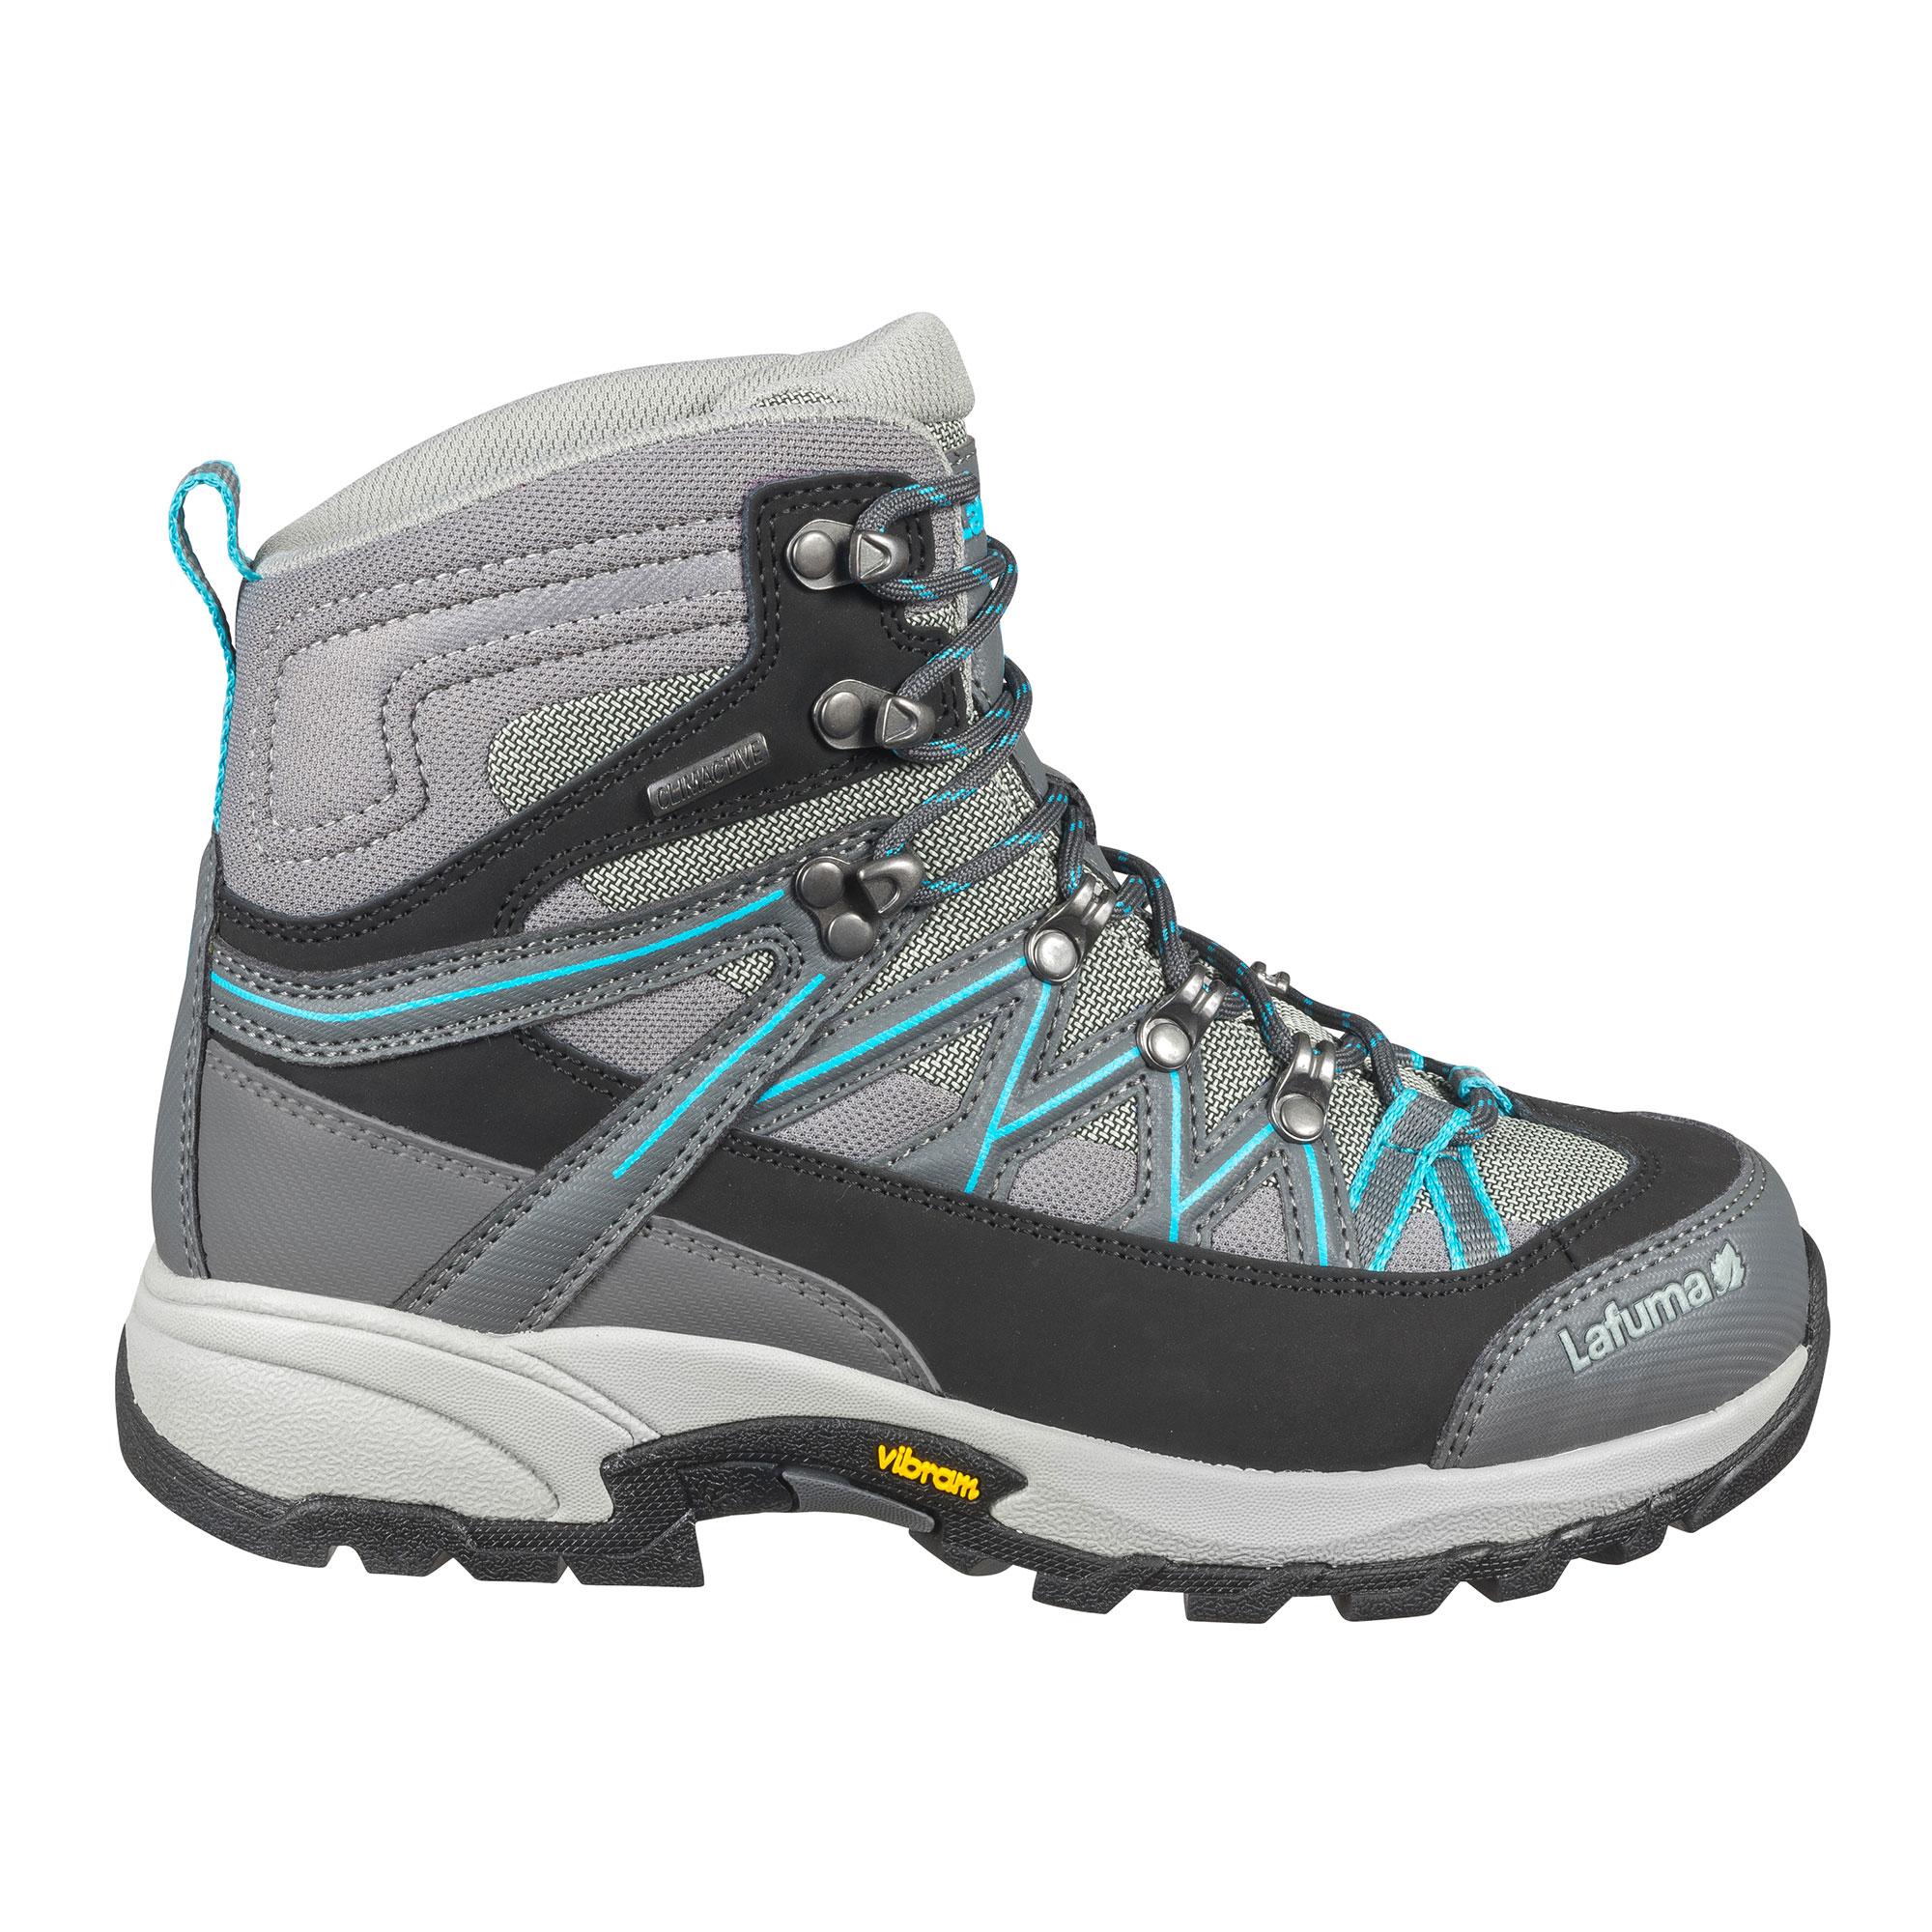 Lafuma - LD Atakama II - Hiking Boots - Women's